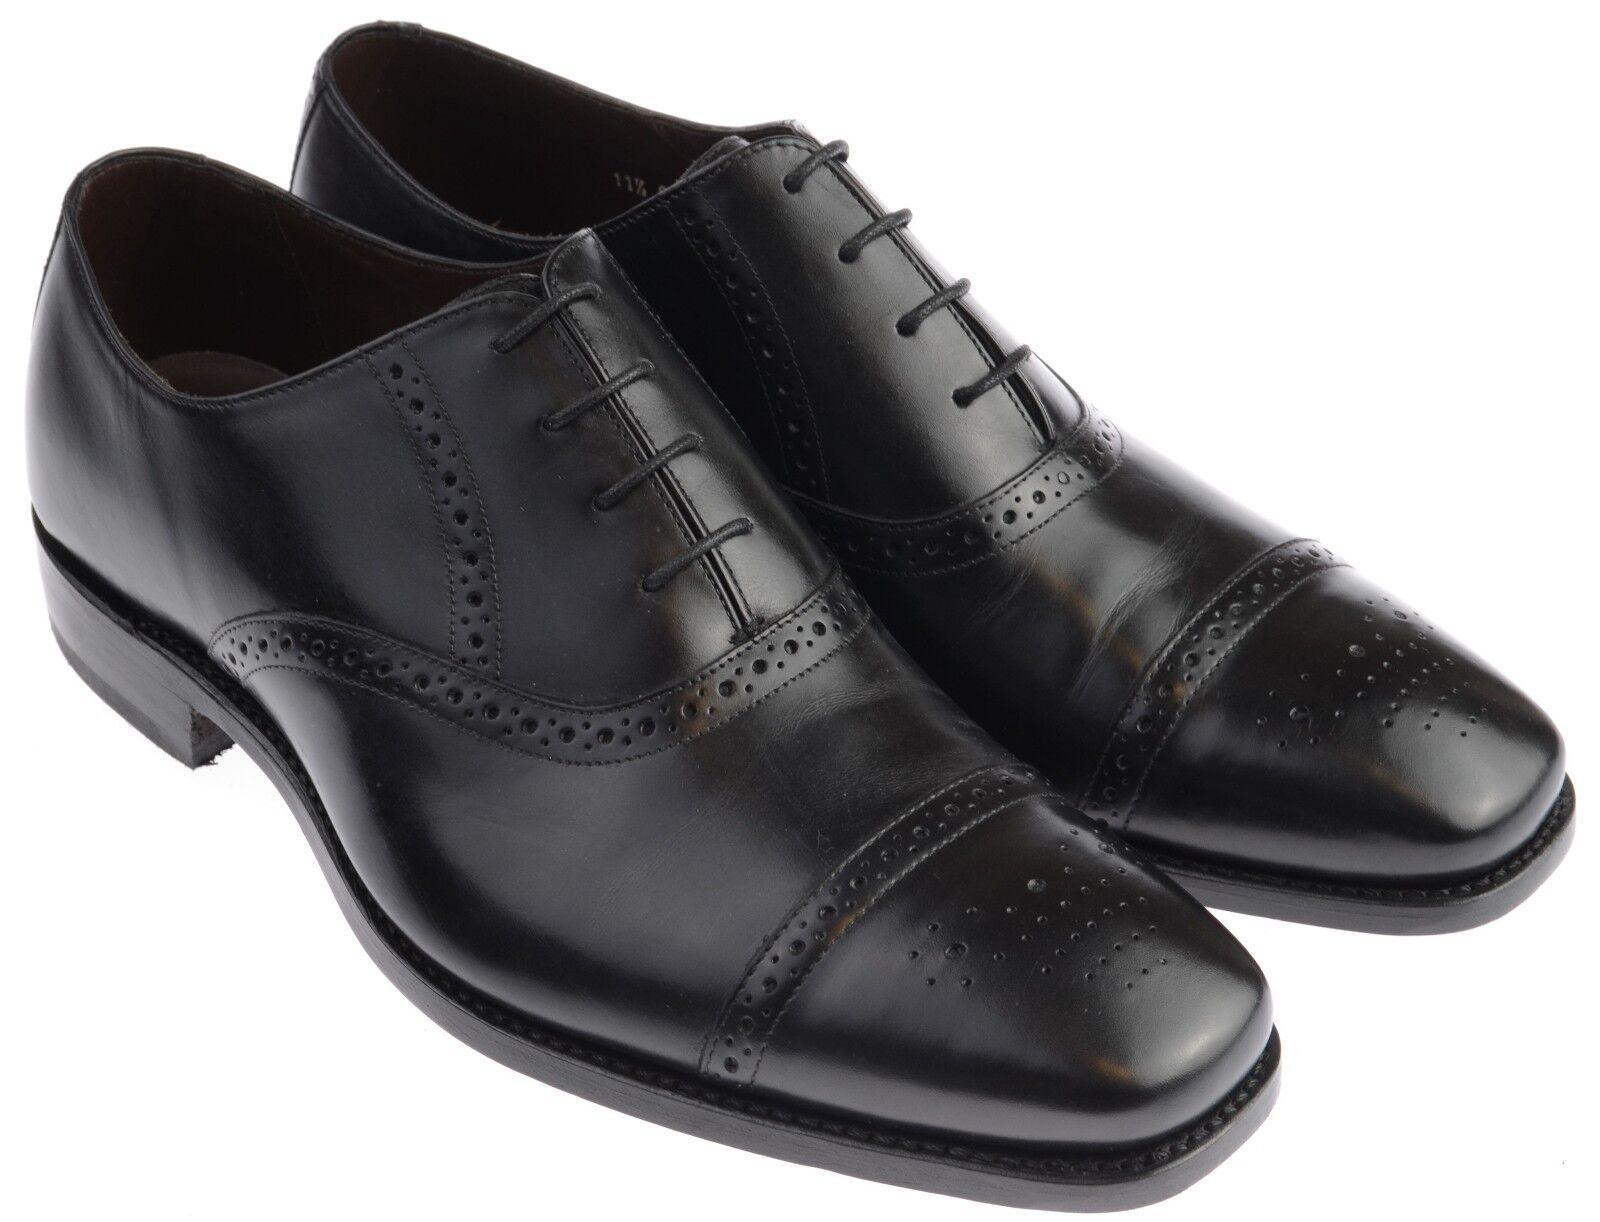 Gentleman's Classic Semi Brogue Barker Flynn Black Calf UK Size 11.5 G Fitting